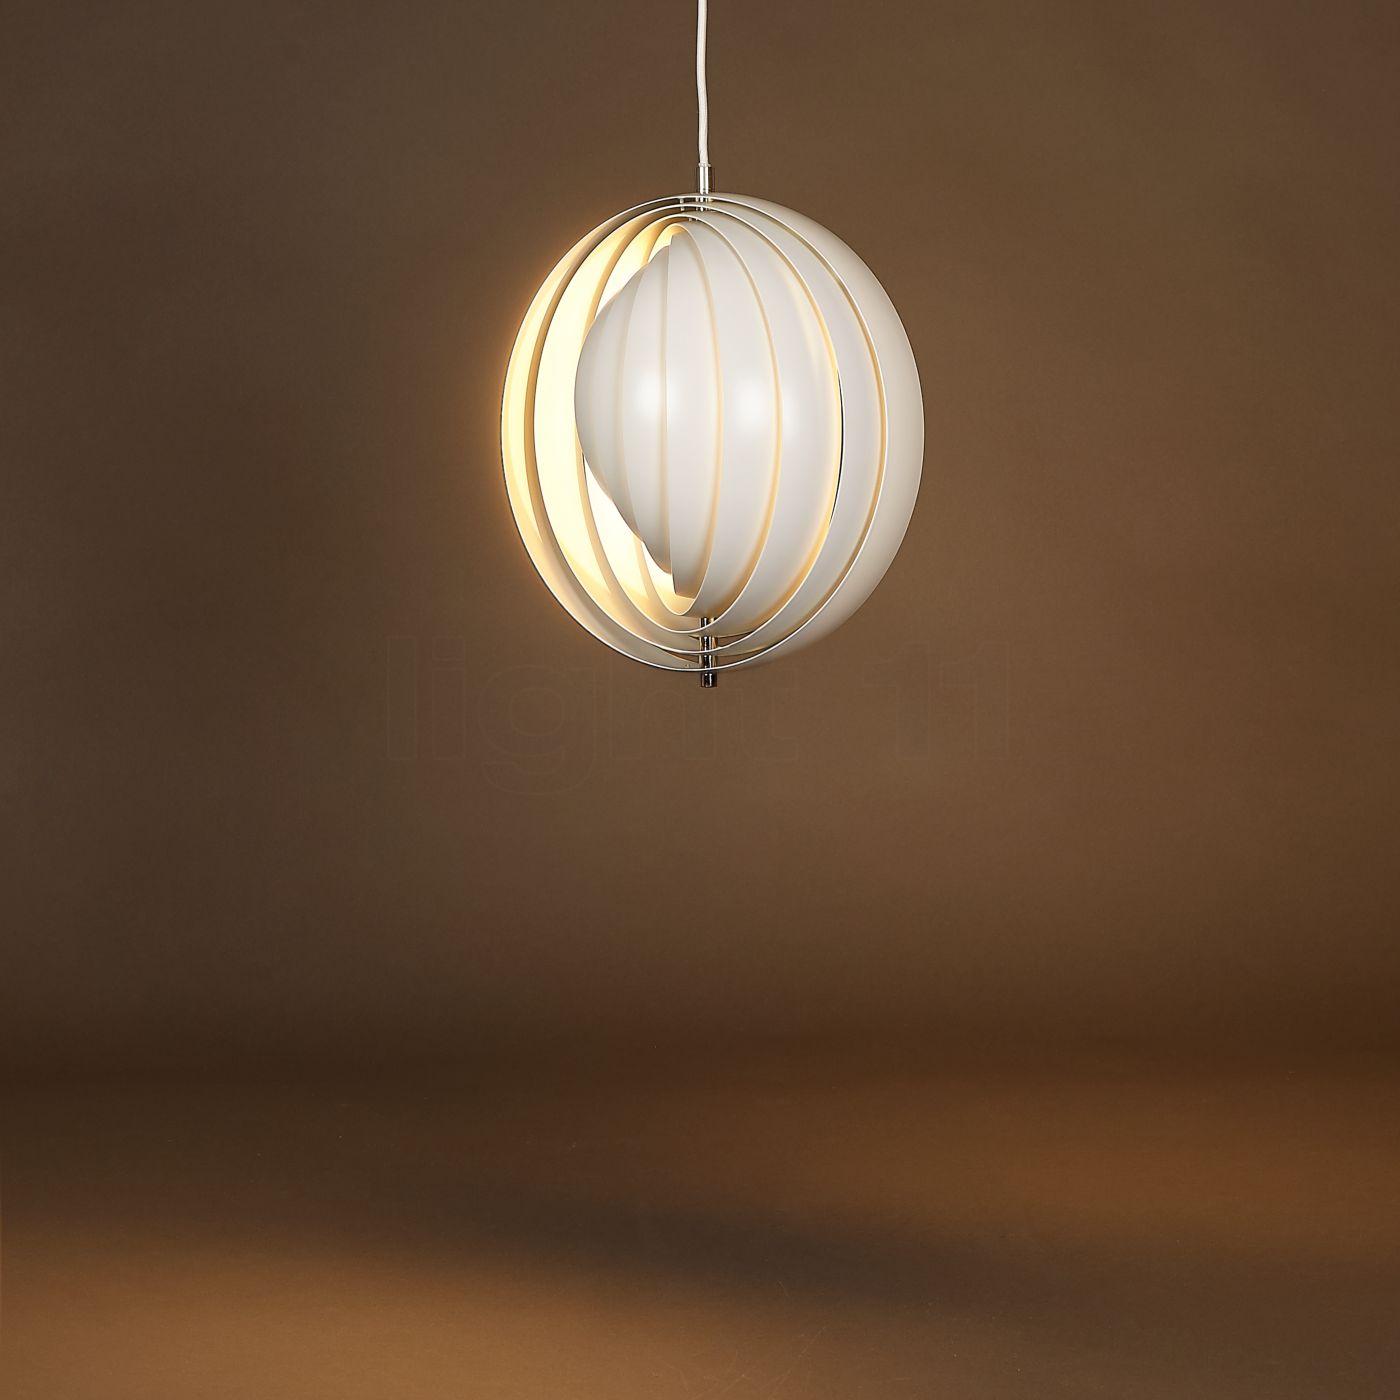 Buy verpan moon pendant light at light11 aloadofball Images